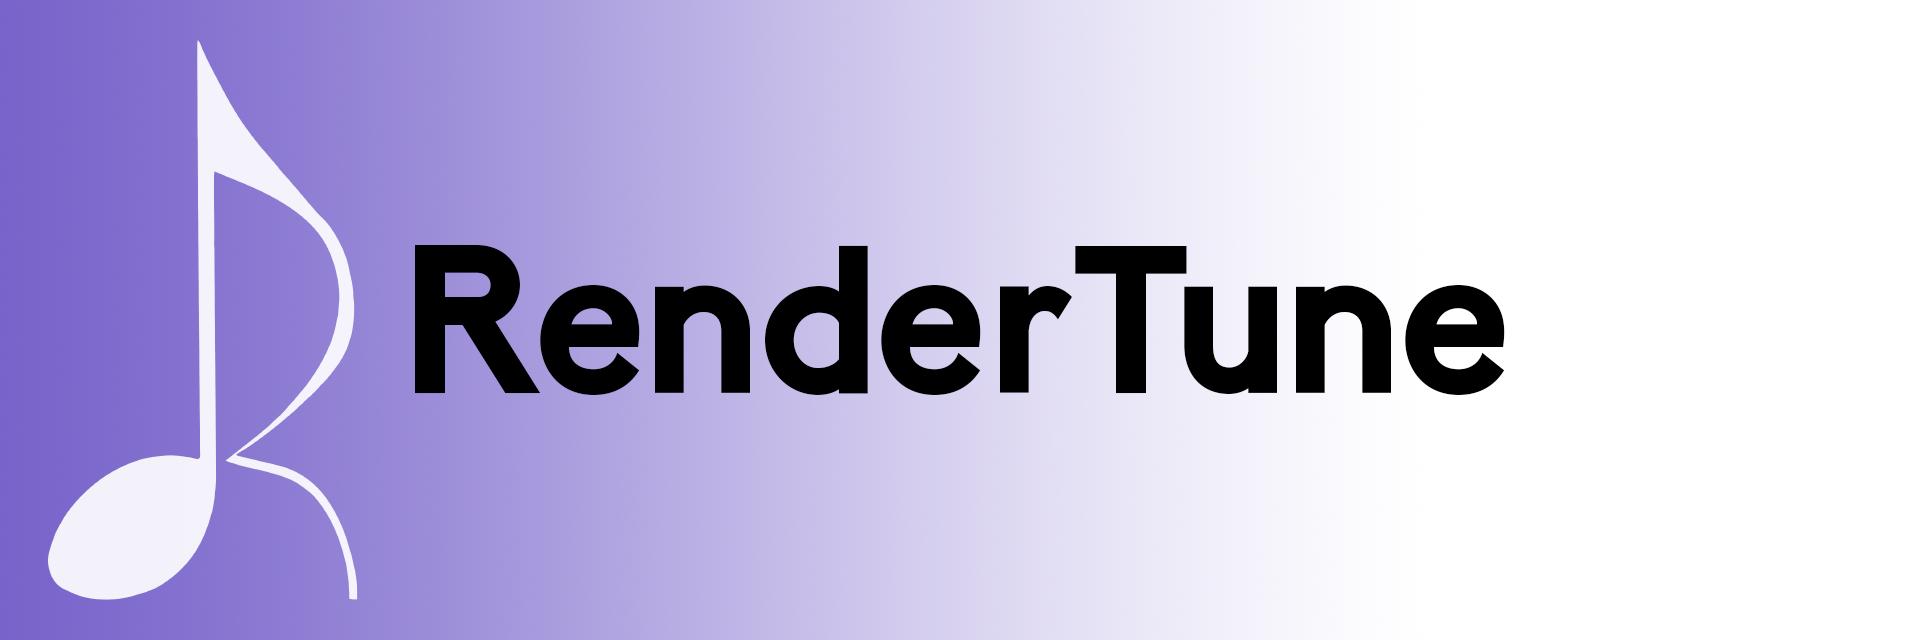 RenderTune banner